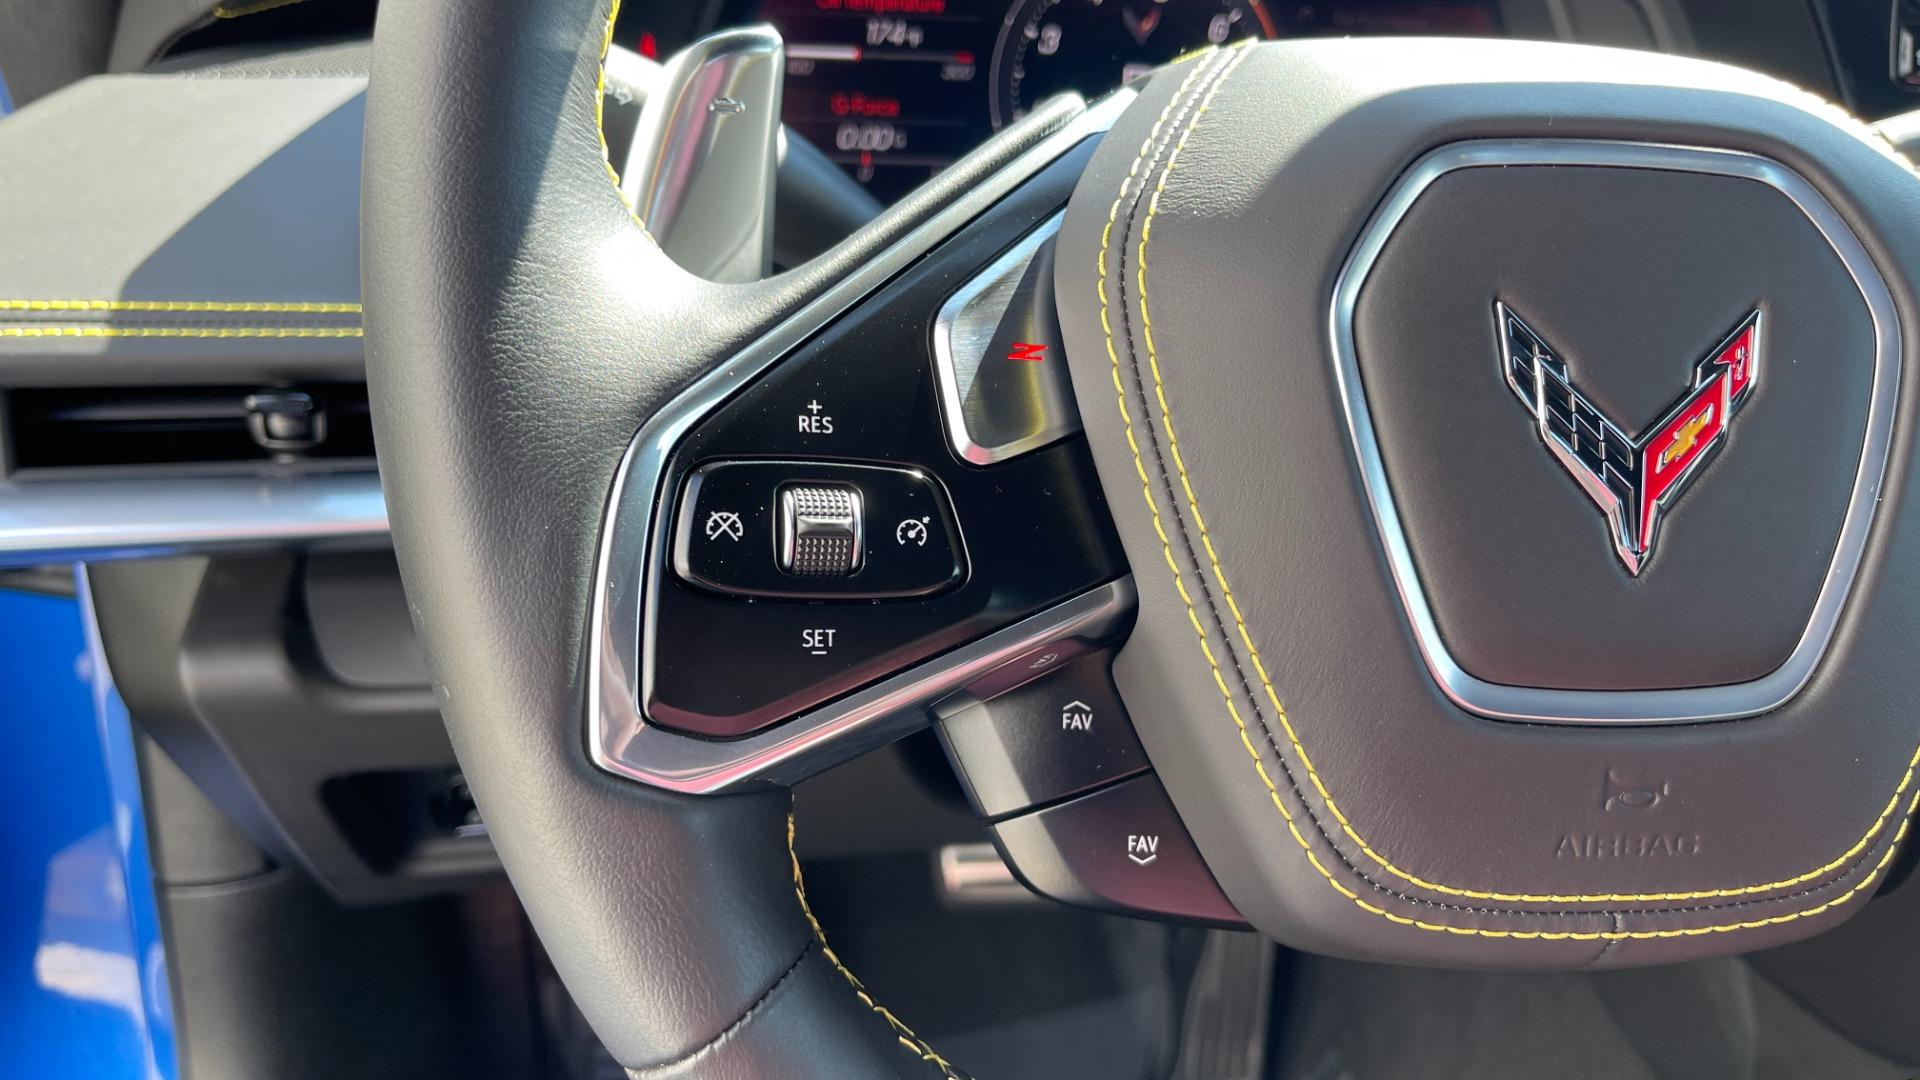 Used 2021 Chevrolet CORVETTE STINGRAY 3LT COUPE / 8-SPD / PERF PKG / NAV / BOSE / REARVIEW for sale $110,995 at Formula Imports in Charlotte NC 28227 31